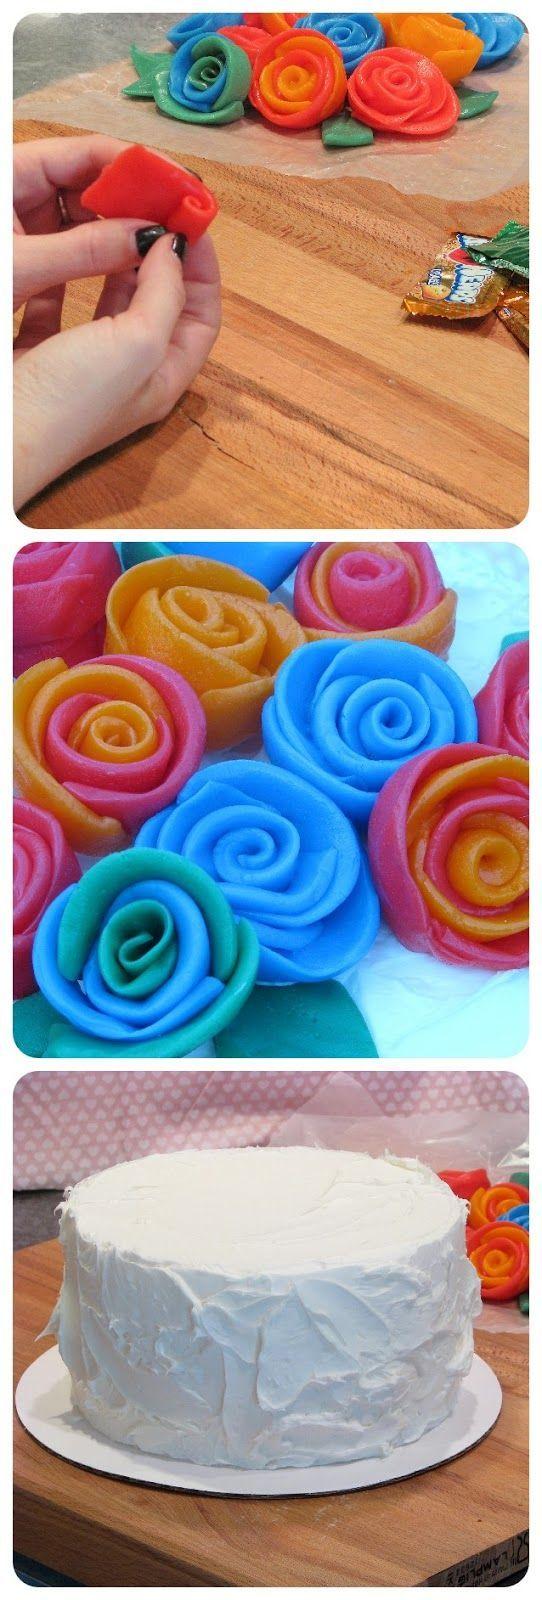 airheads rose cake diy – helllooooo valentine! | How Do It